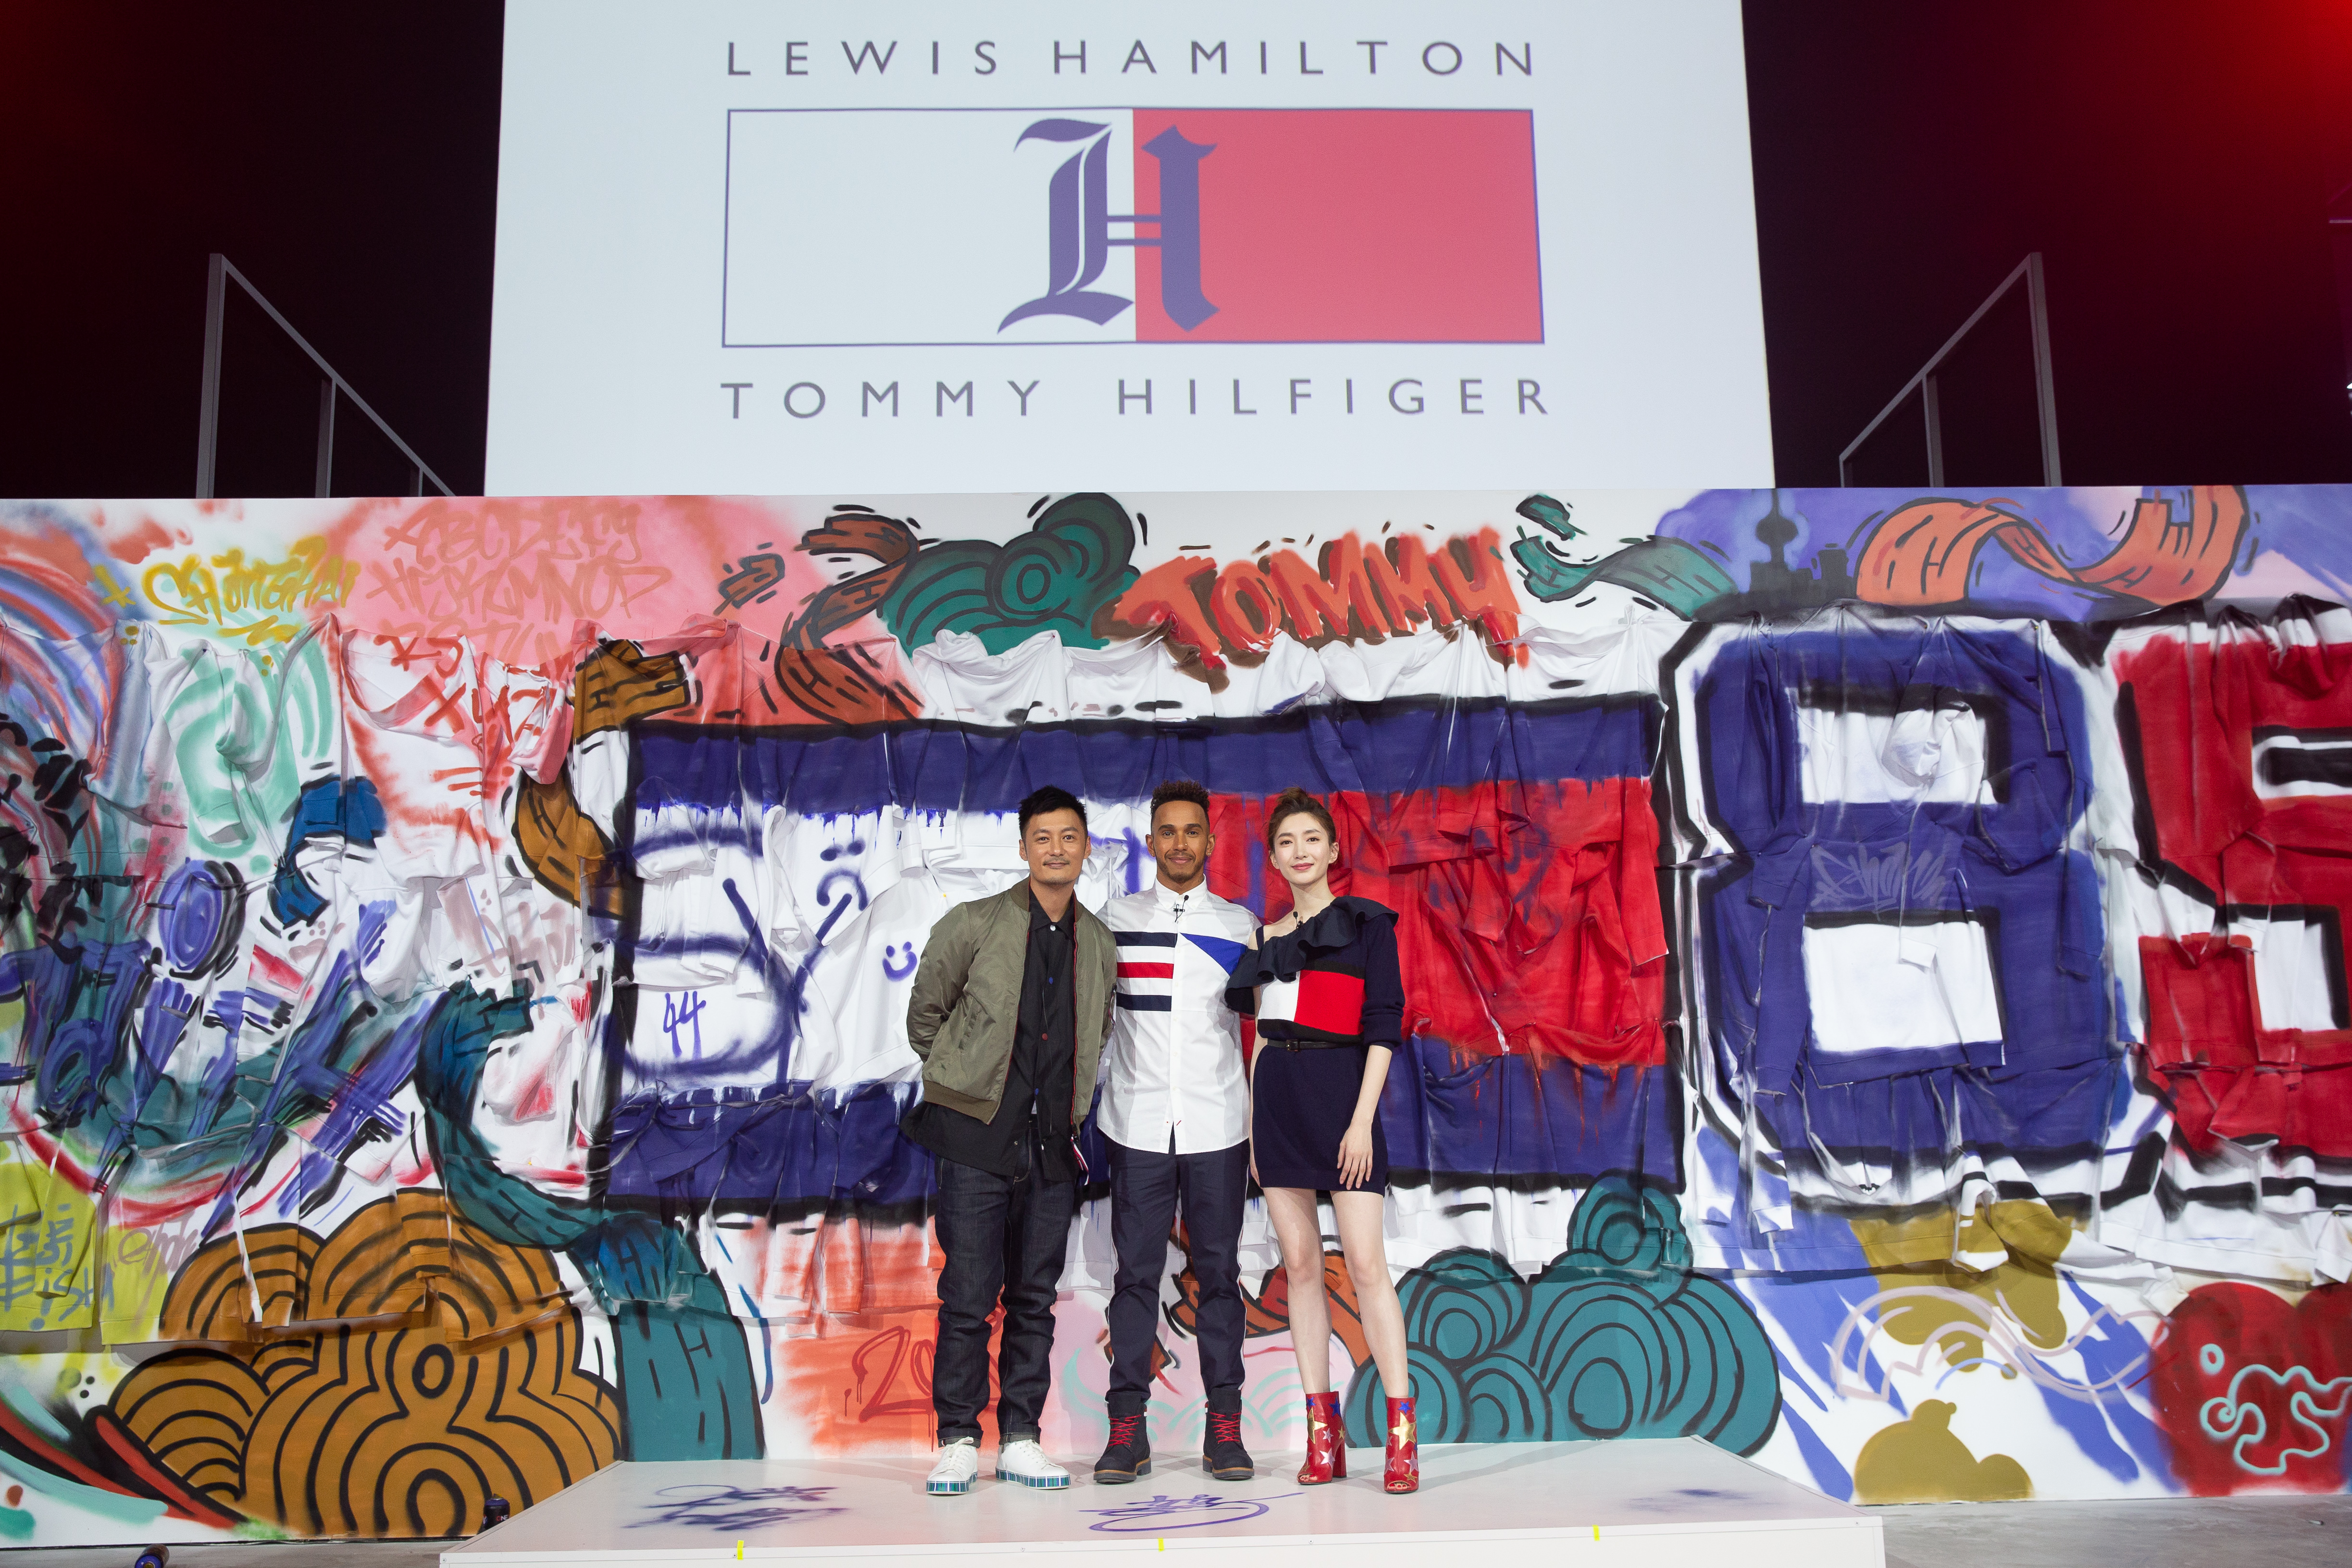 Tommy Hilfiger e Lewis Hamilton insieme con 'TommyXLewis